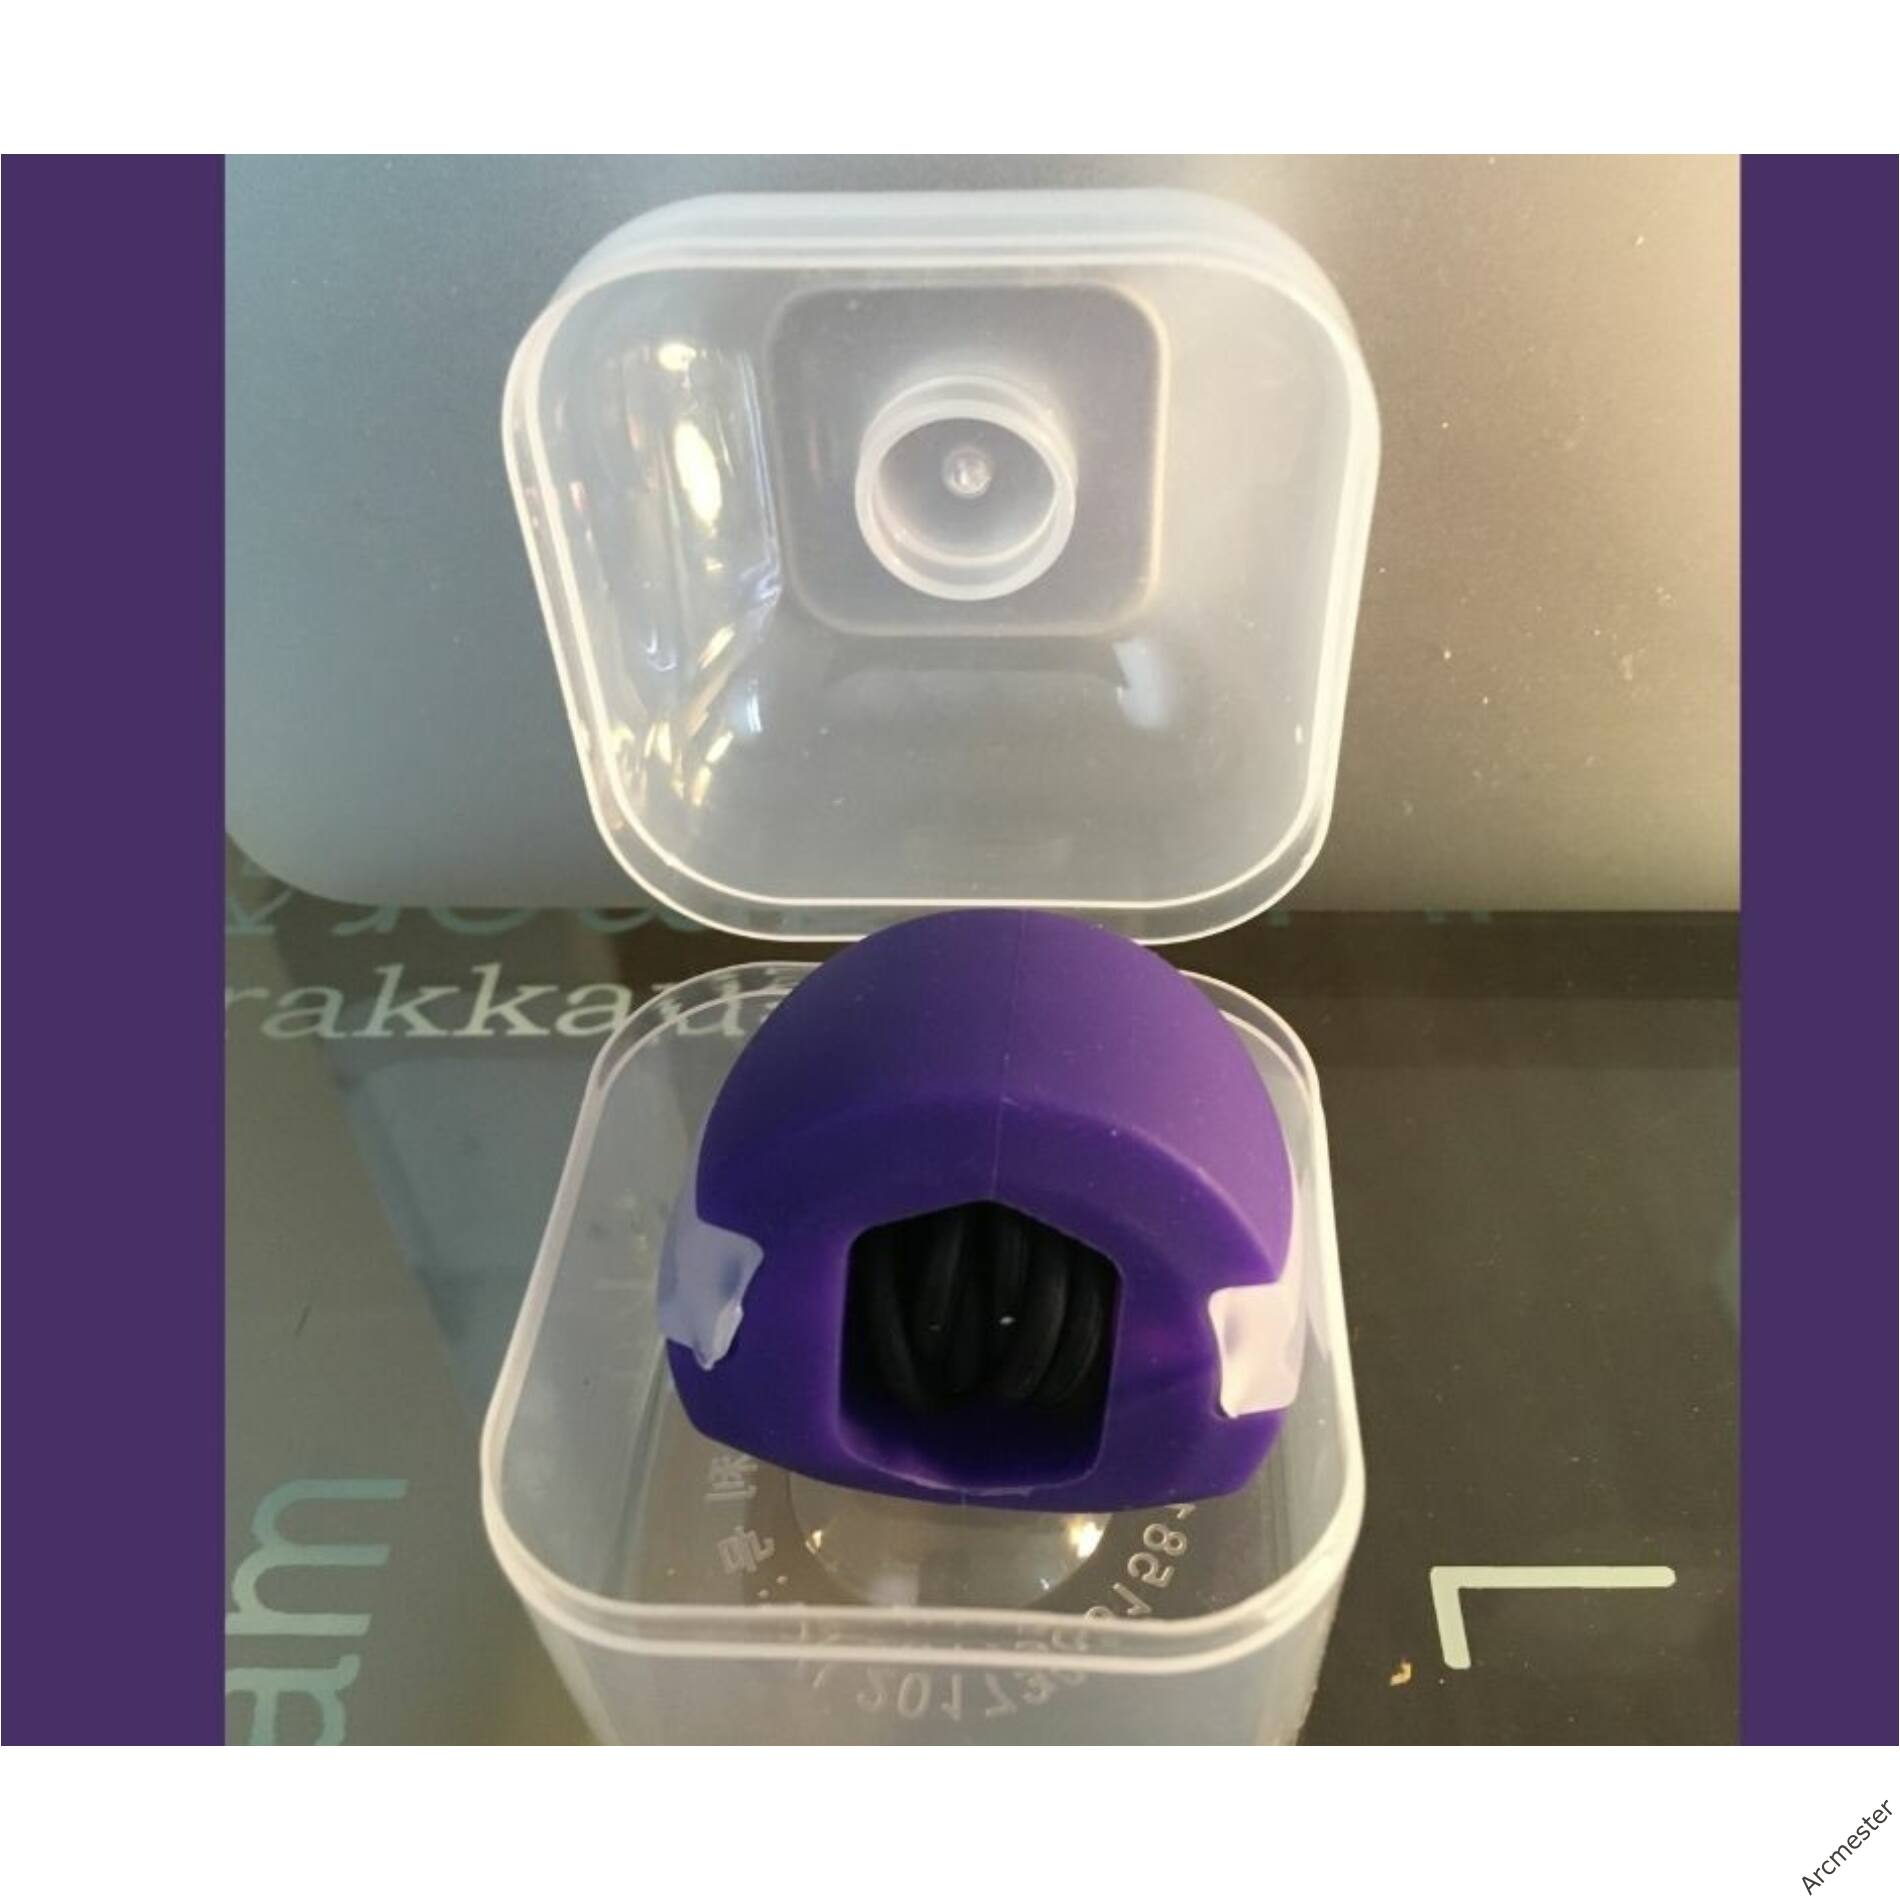 Arcizomedző labda lila + műanyag doboz